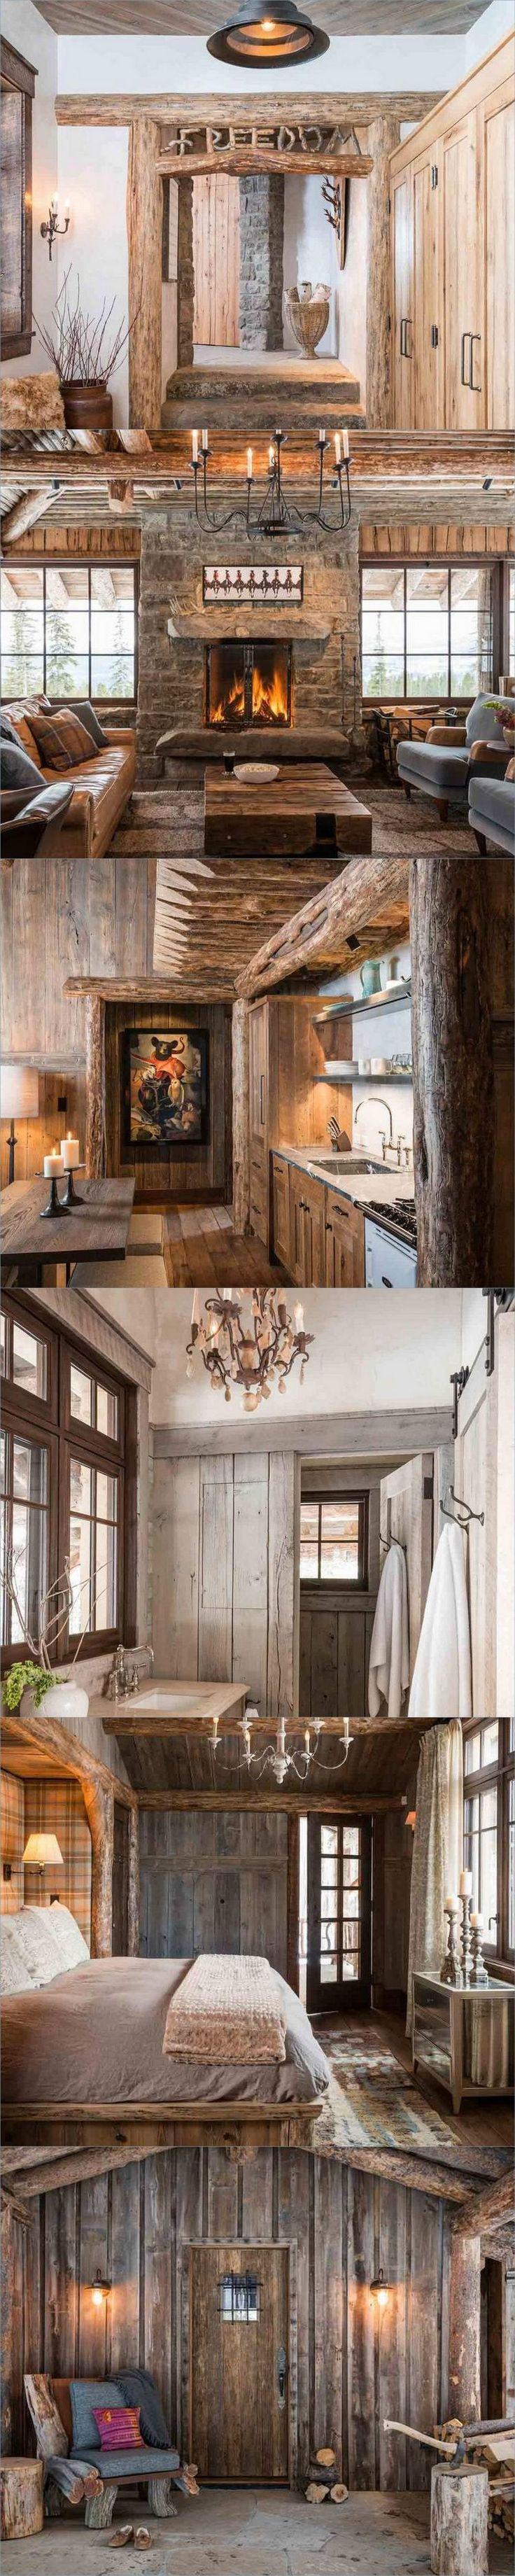 17 best Homes images on Pinterest | Modern kitchen designs, Modern ...